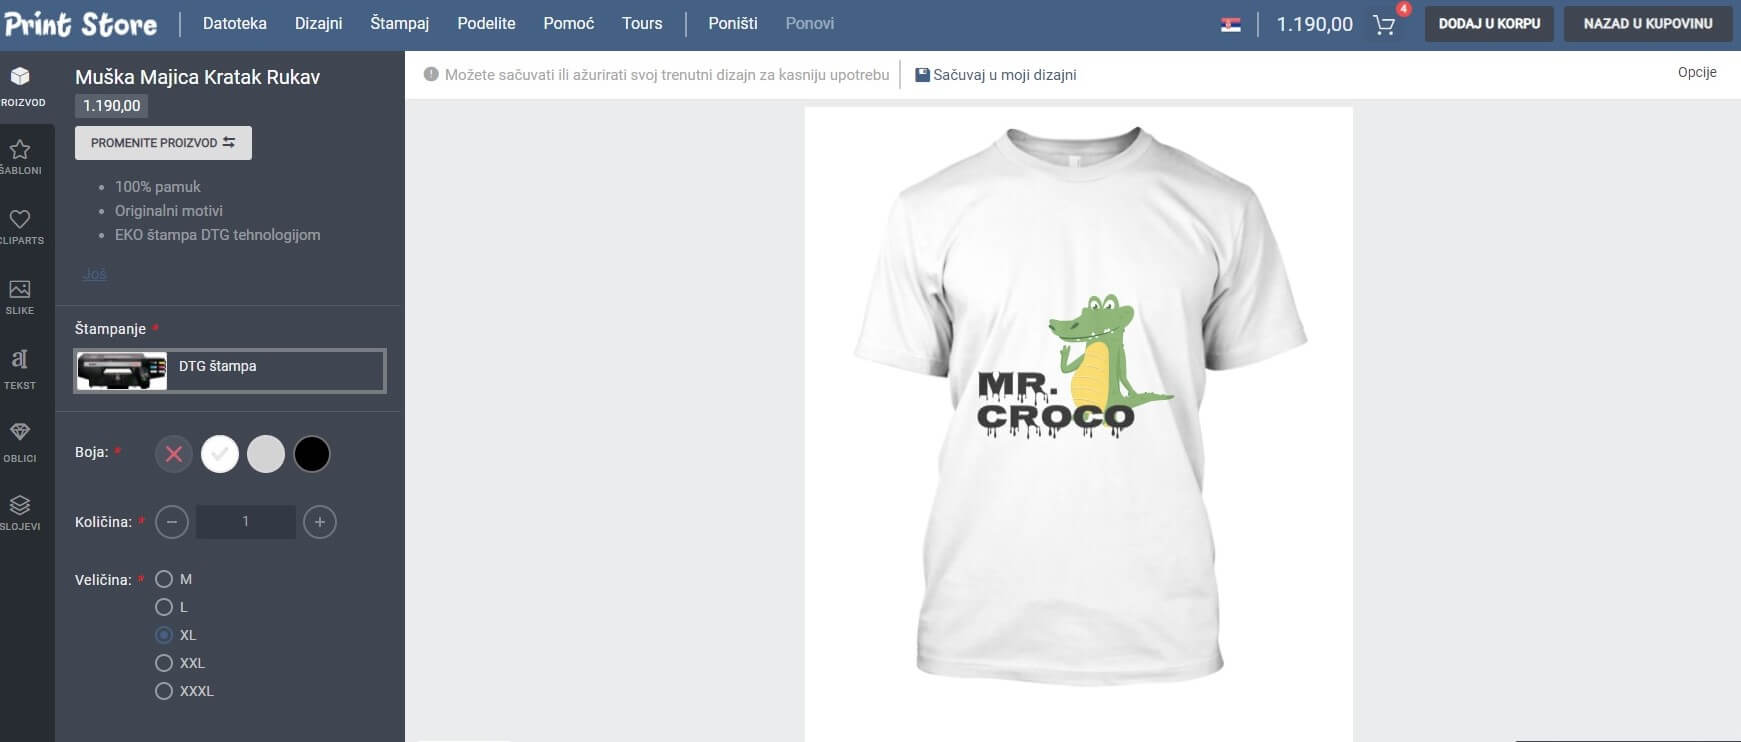 Online dizajner Print Store